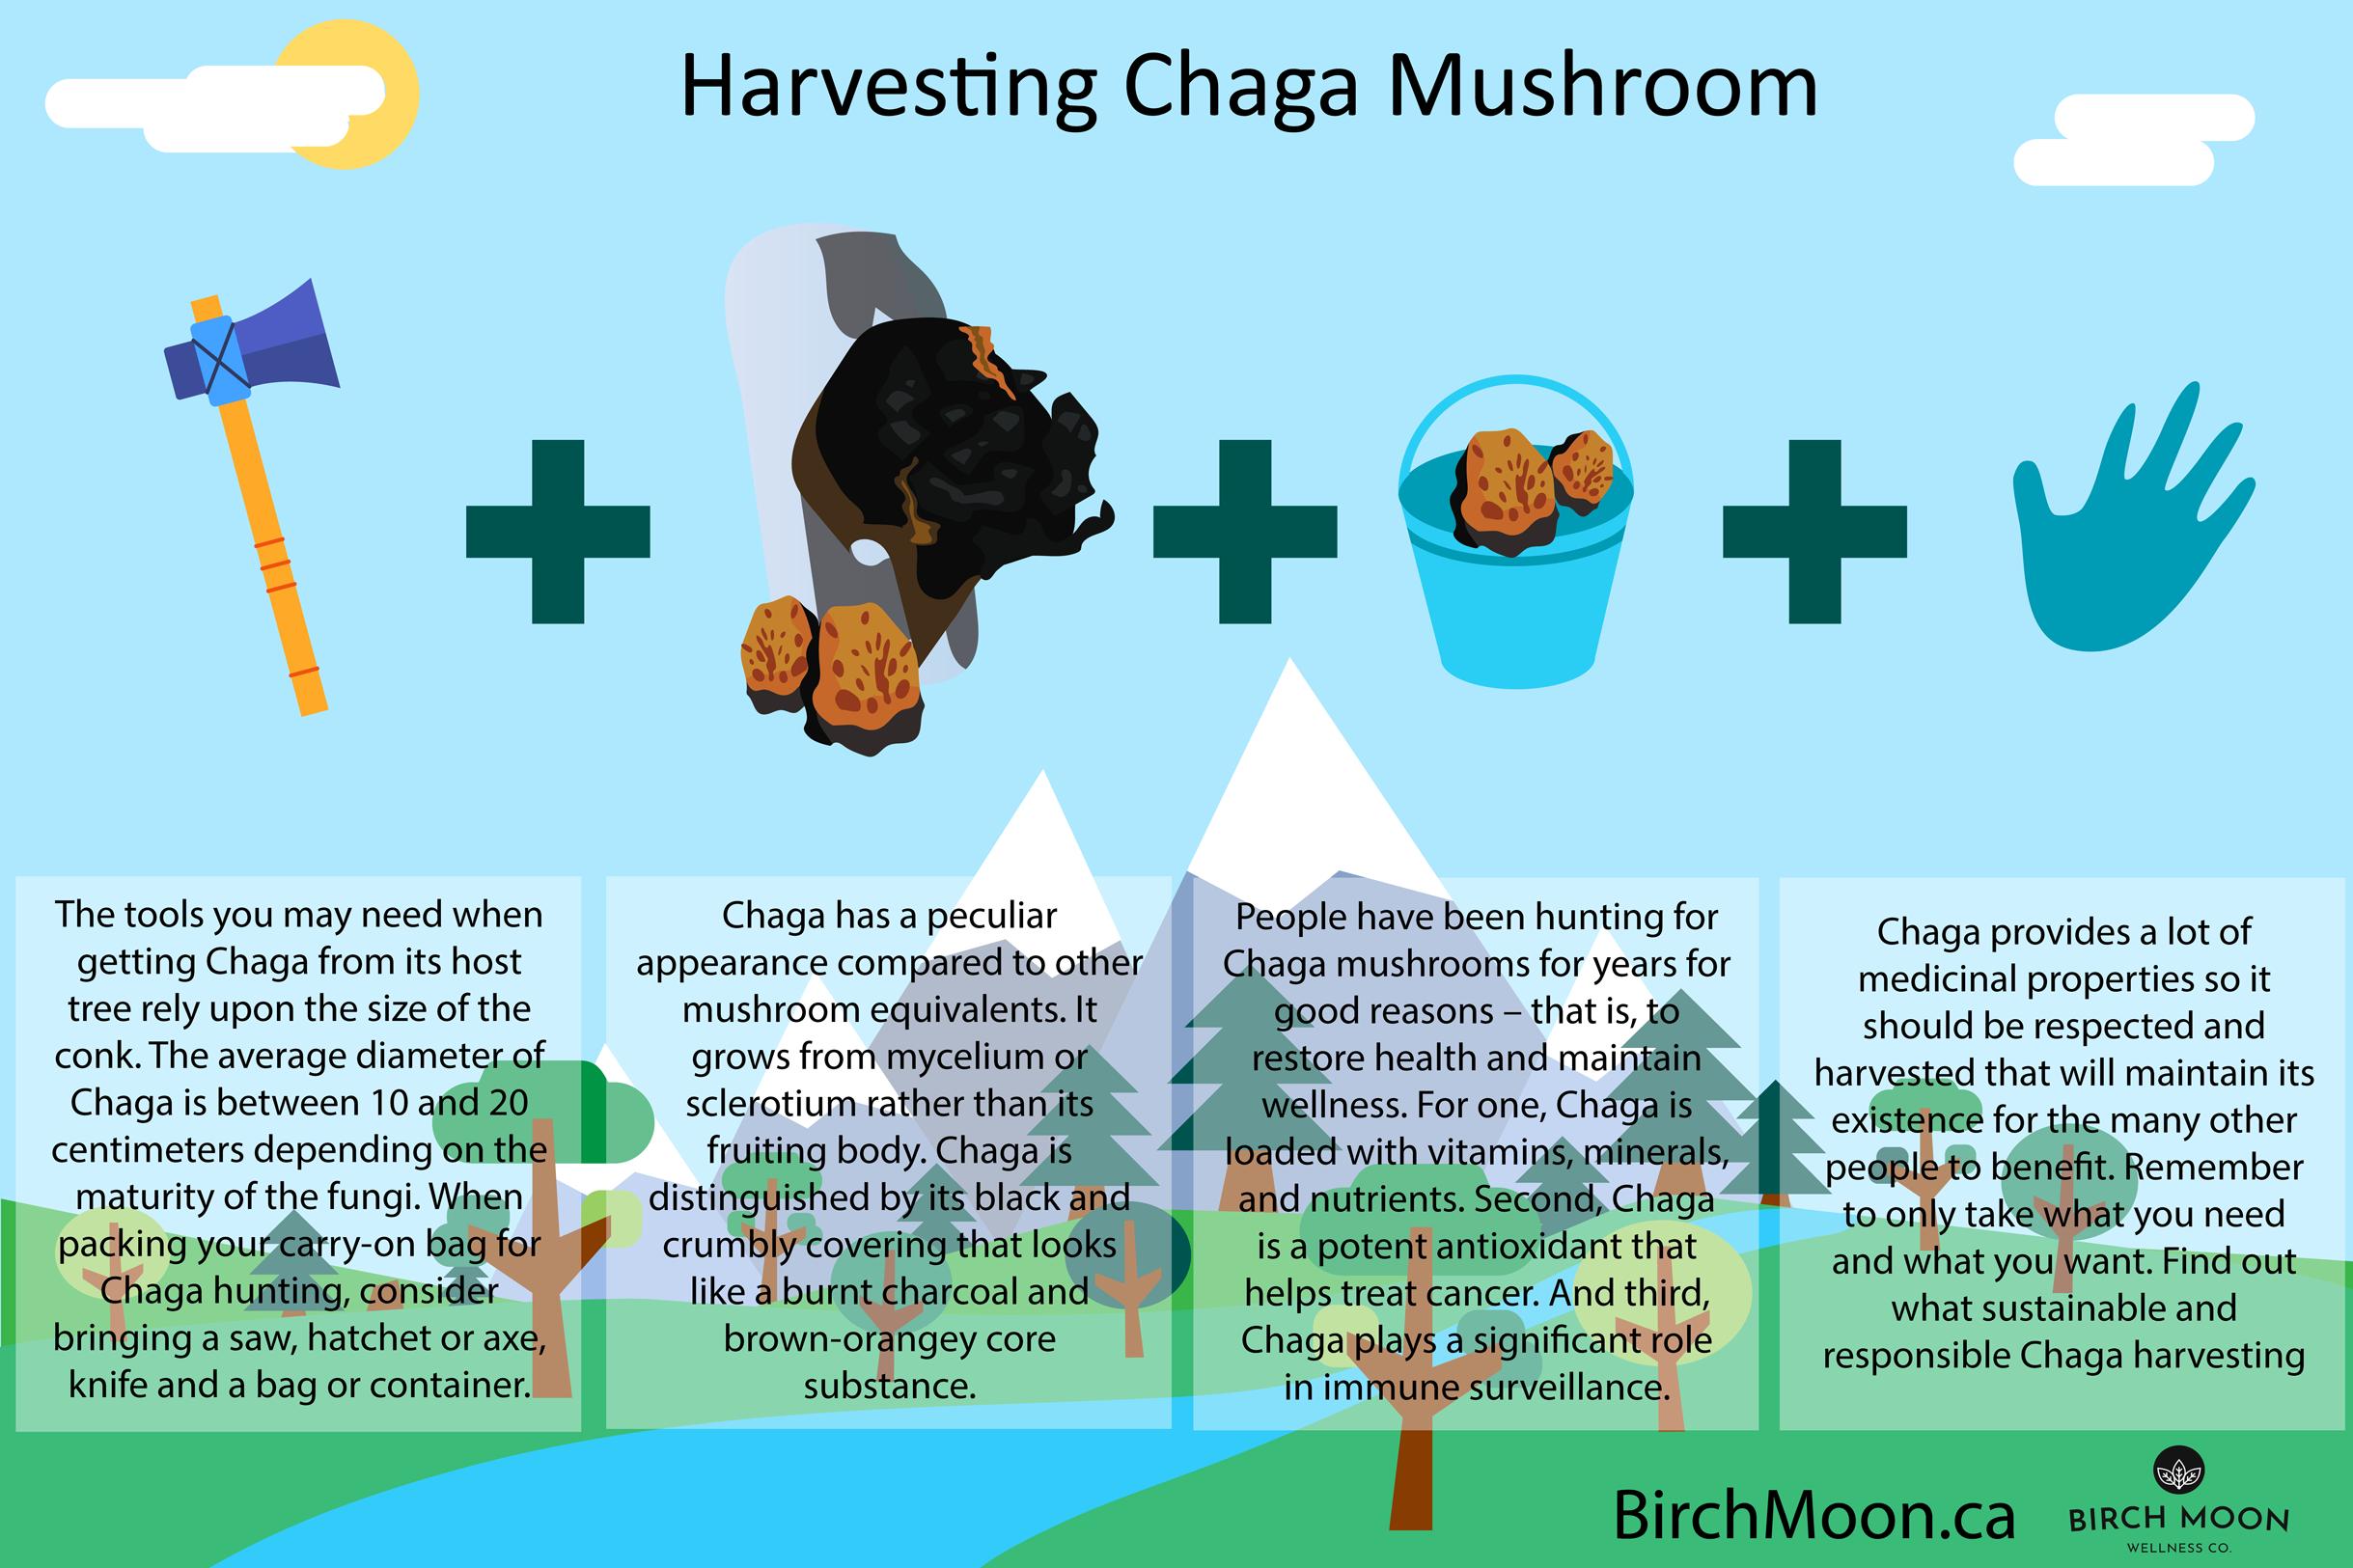 harvesting-chaga-mushroom-infographic-plaza